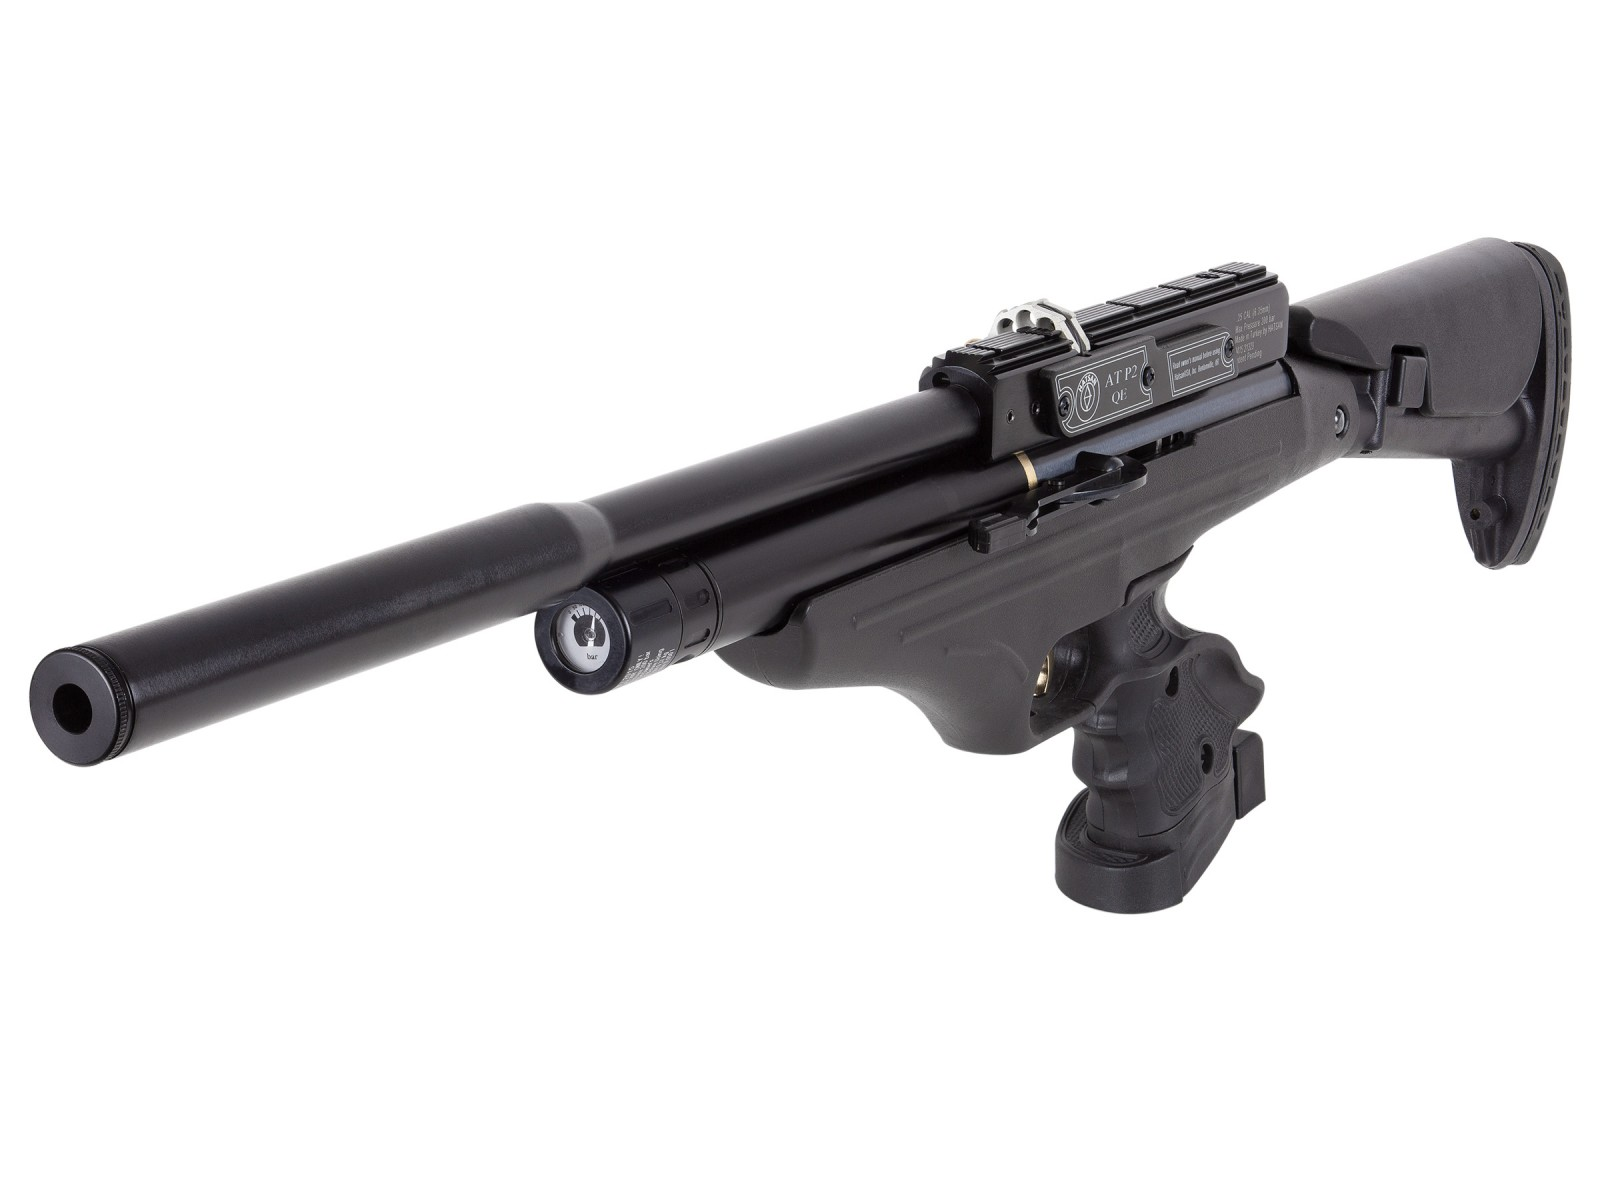 Hatsan AT P2 Quiet Energy Tact Pistol 0.25 Image